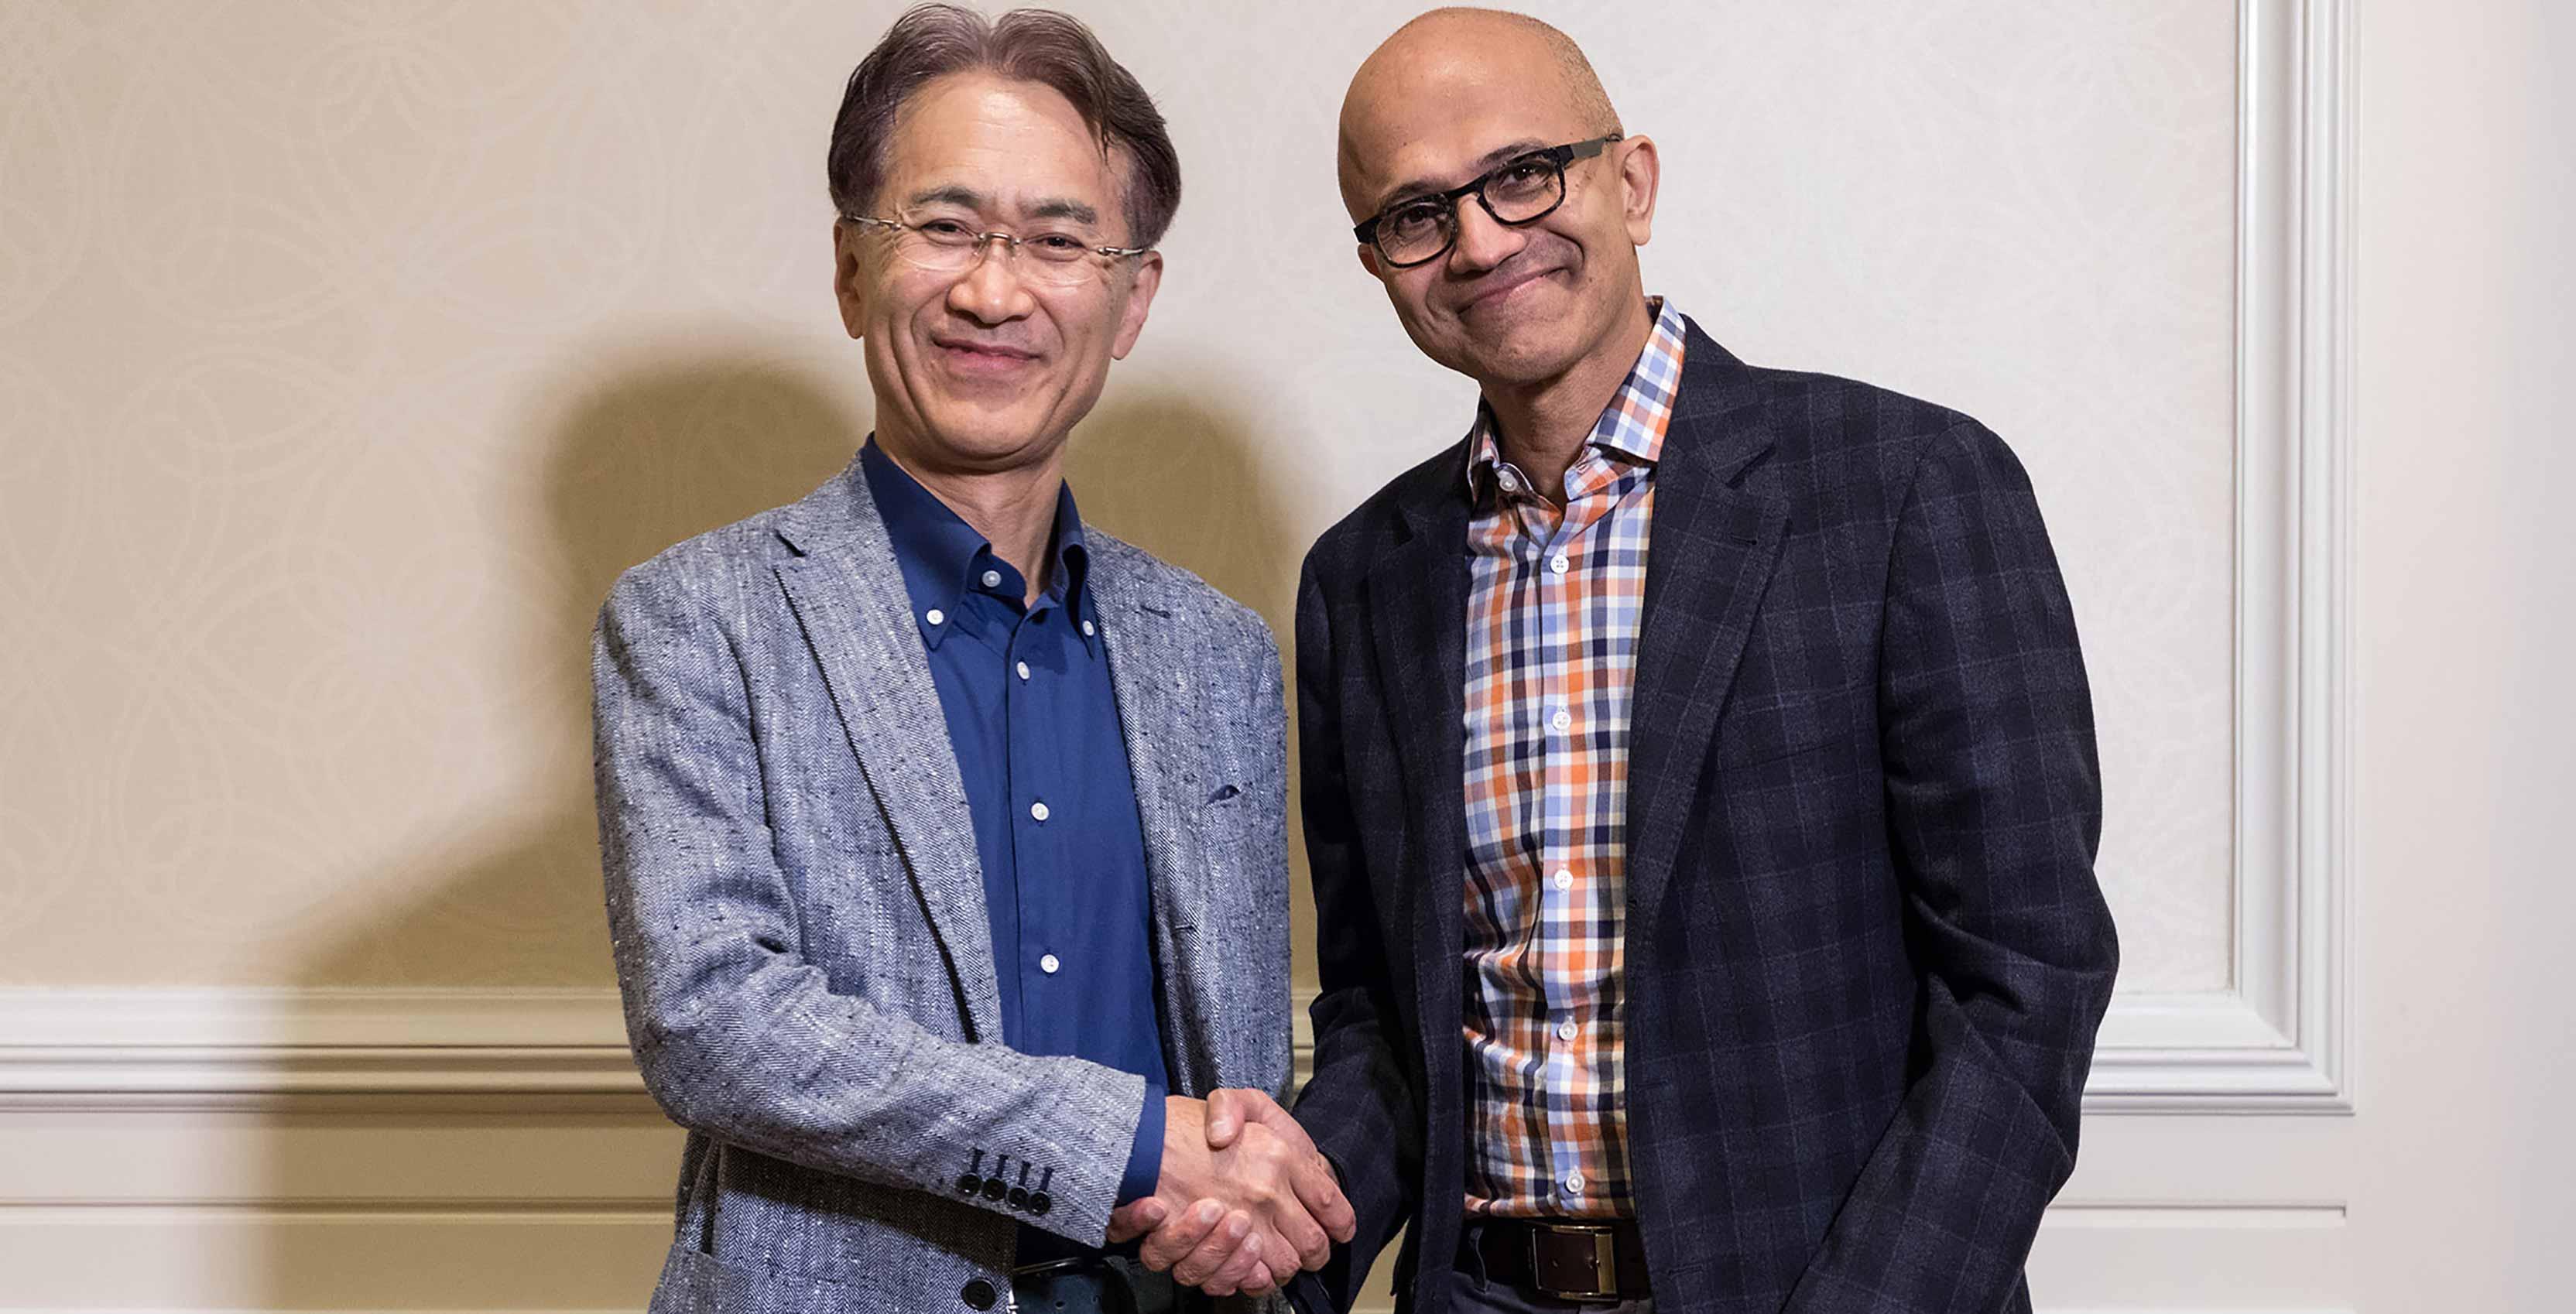 Sony's Kenichiro Yoshida with Microsoft's Satya Nadella